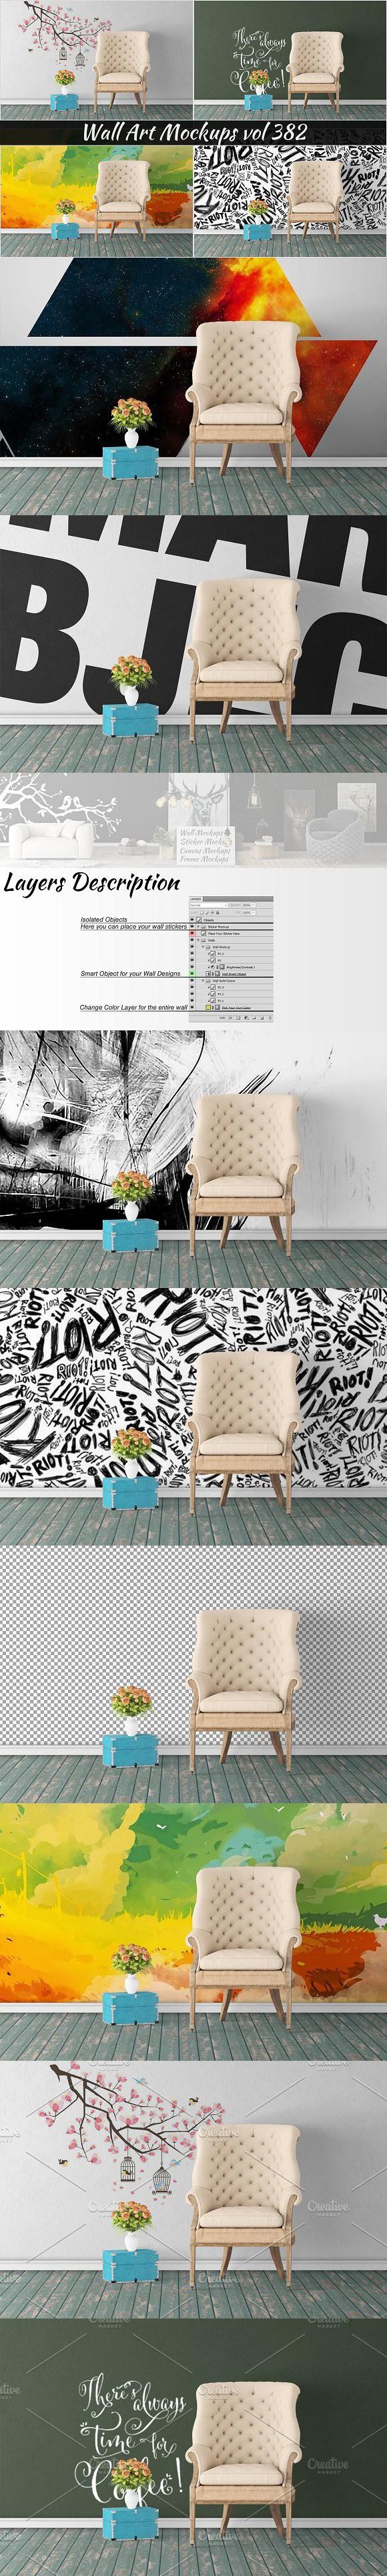 Wall Mockup - Sticker Mockup Vol 382. Poster Designs